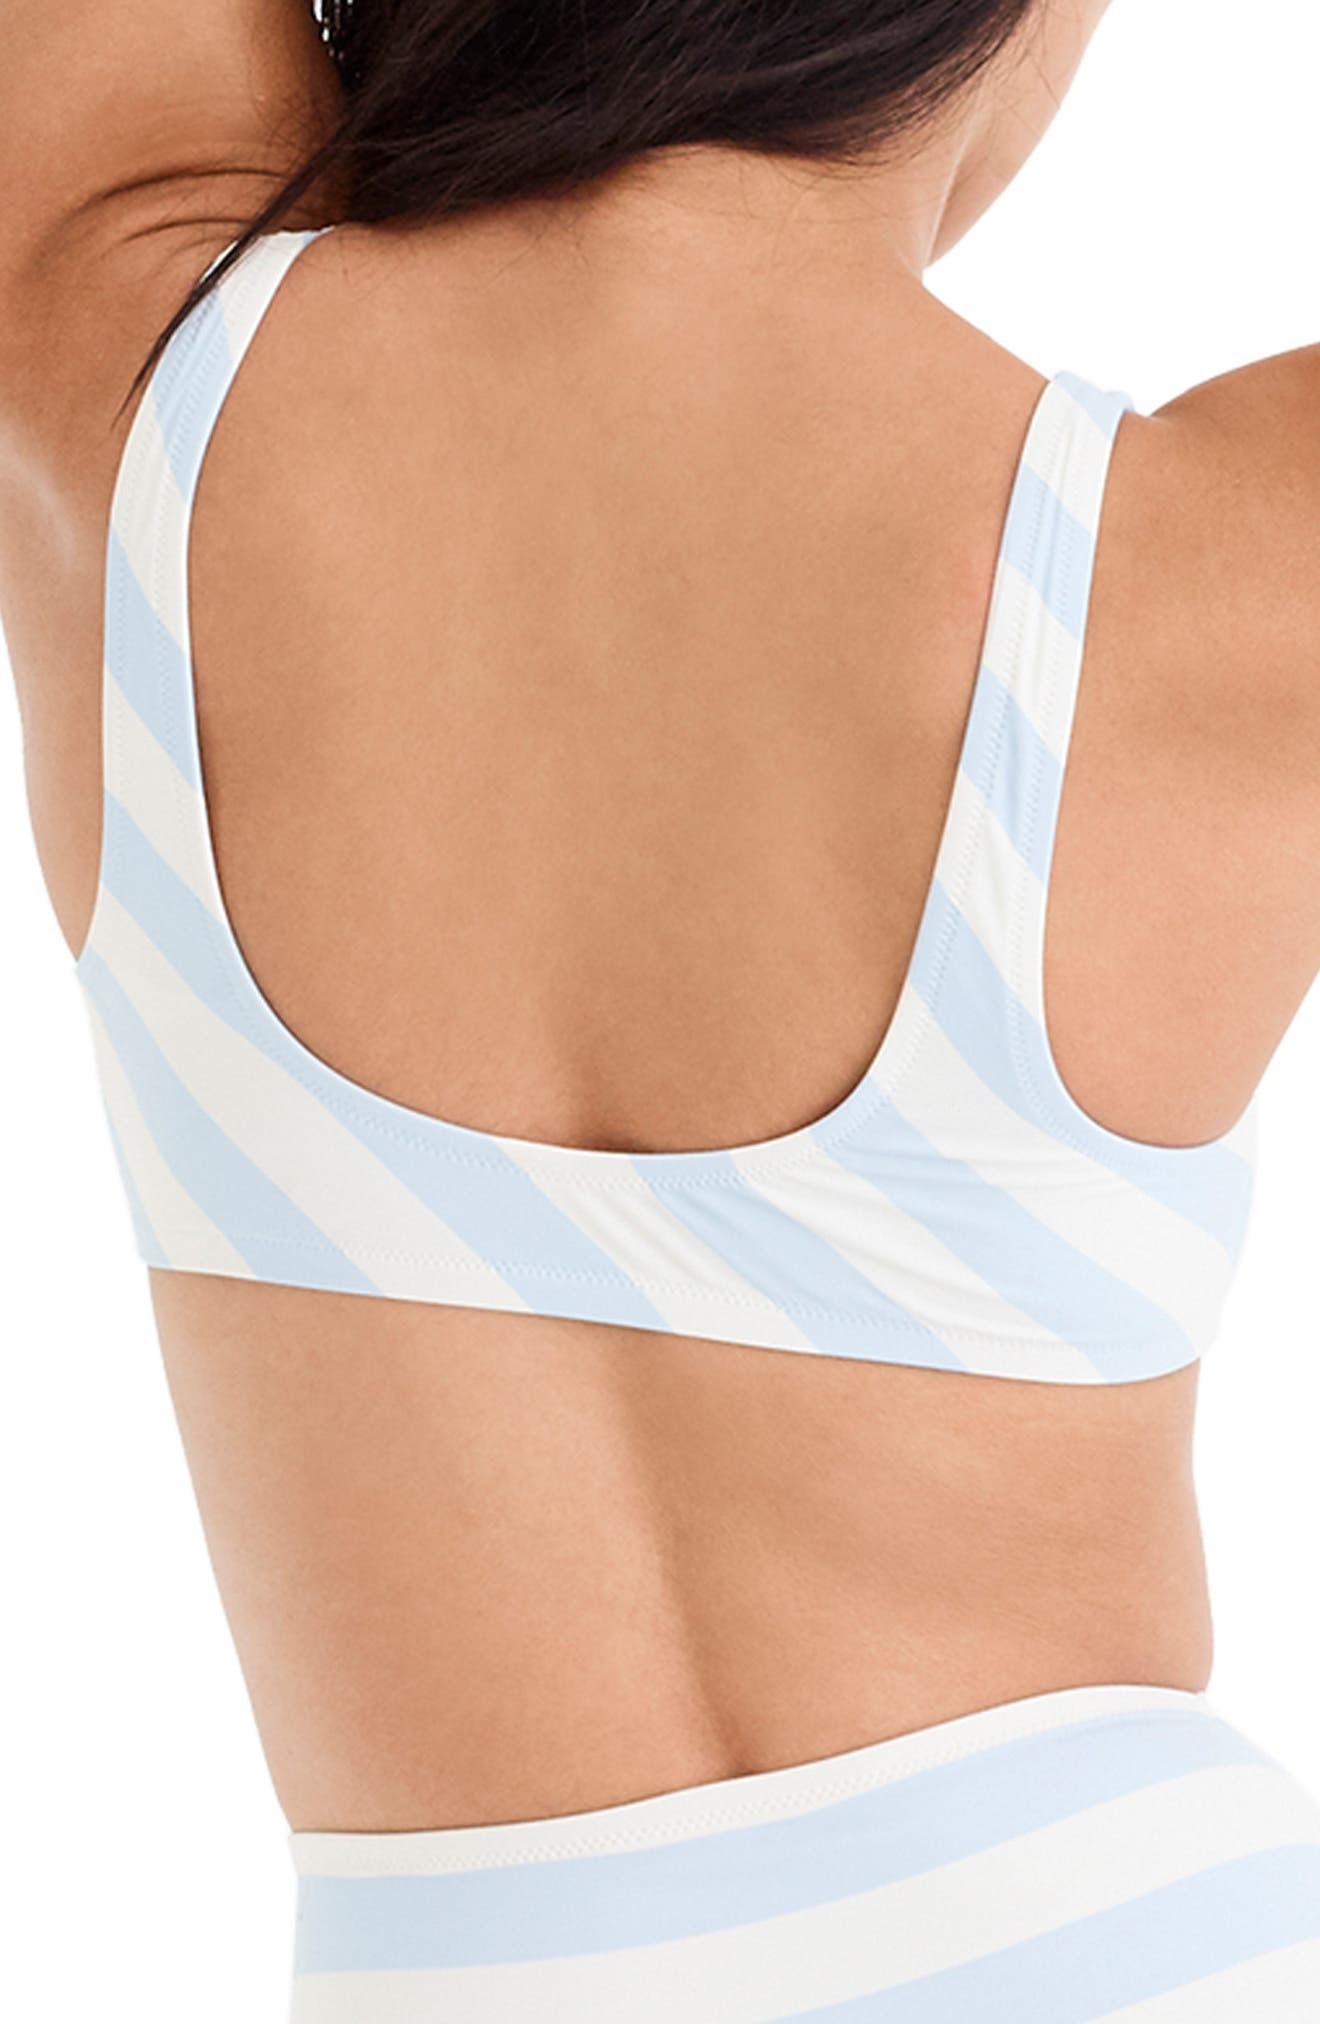 J.CREW, Stripe Scoop Neck Bikini Top, Alternate thumbnail 2, color, 400